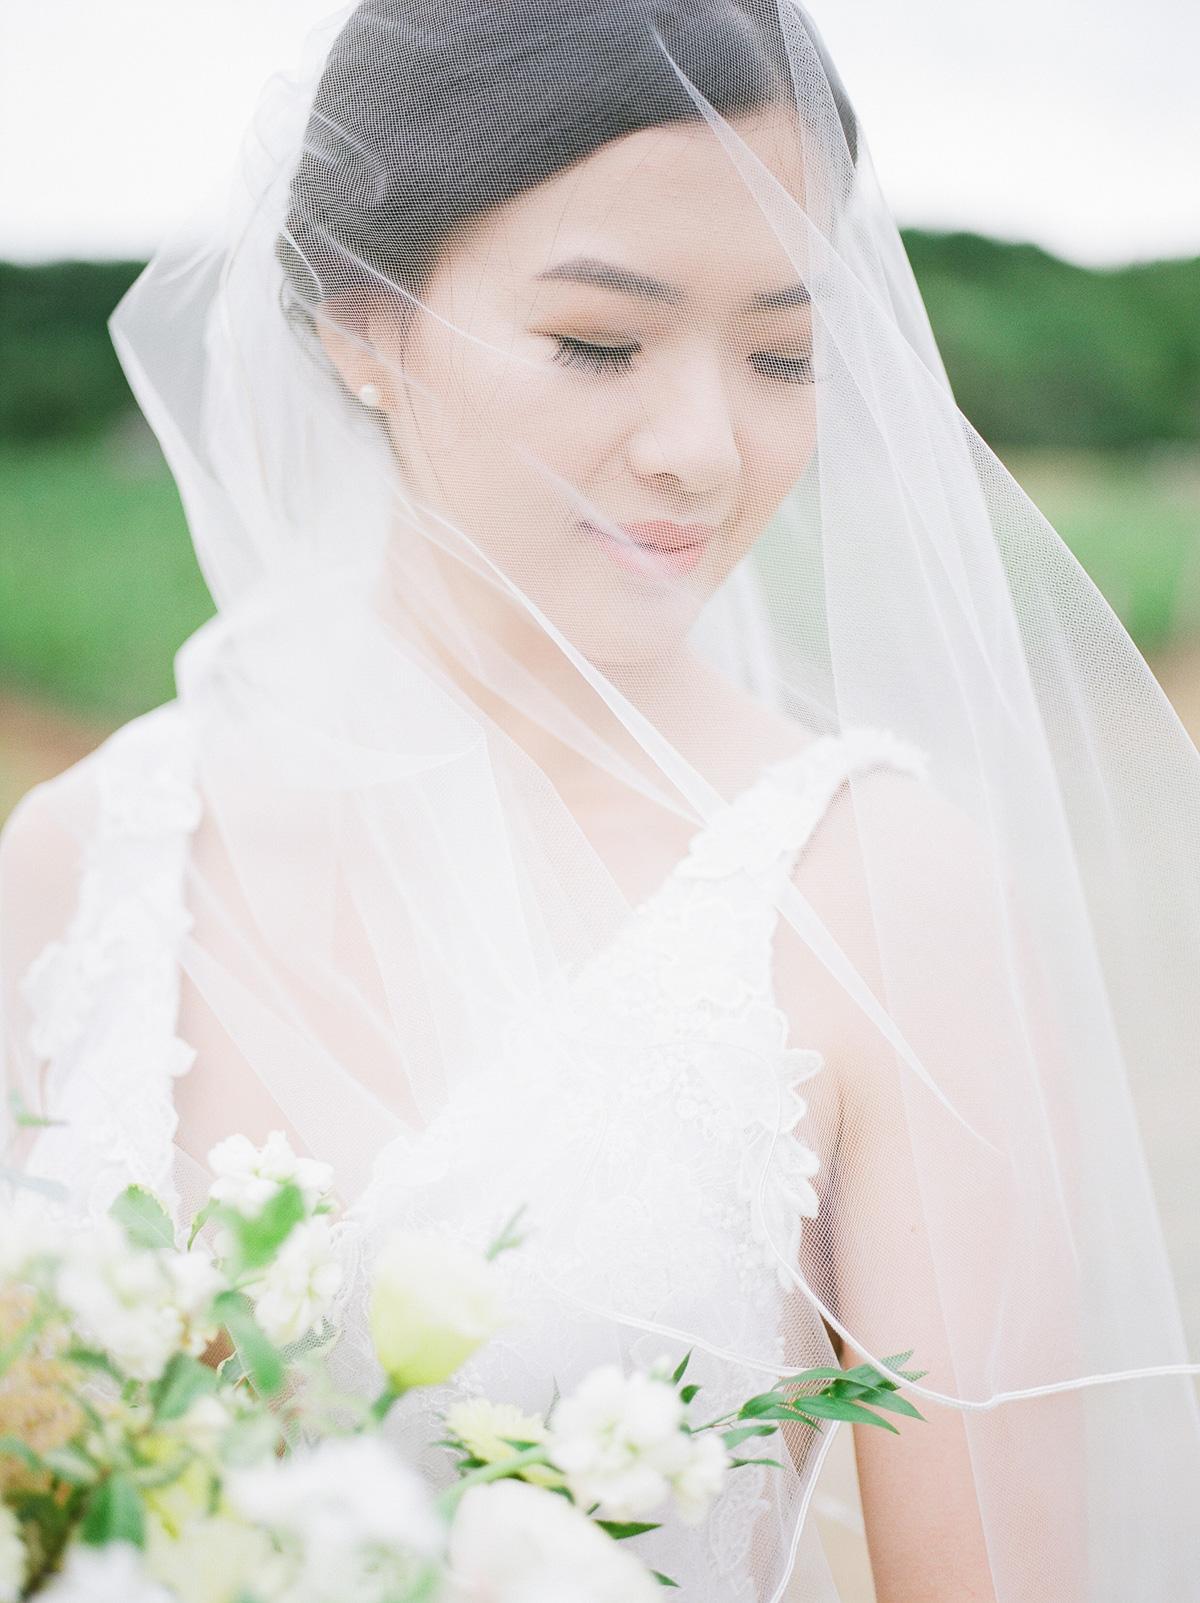 jennifer-xu-photography-vineyard-bride-swish-list-rosewod-eatstes-winery-beamsville-wedding-editorial-8.jpg